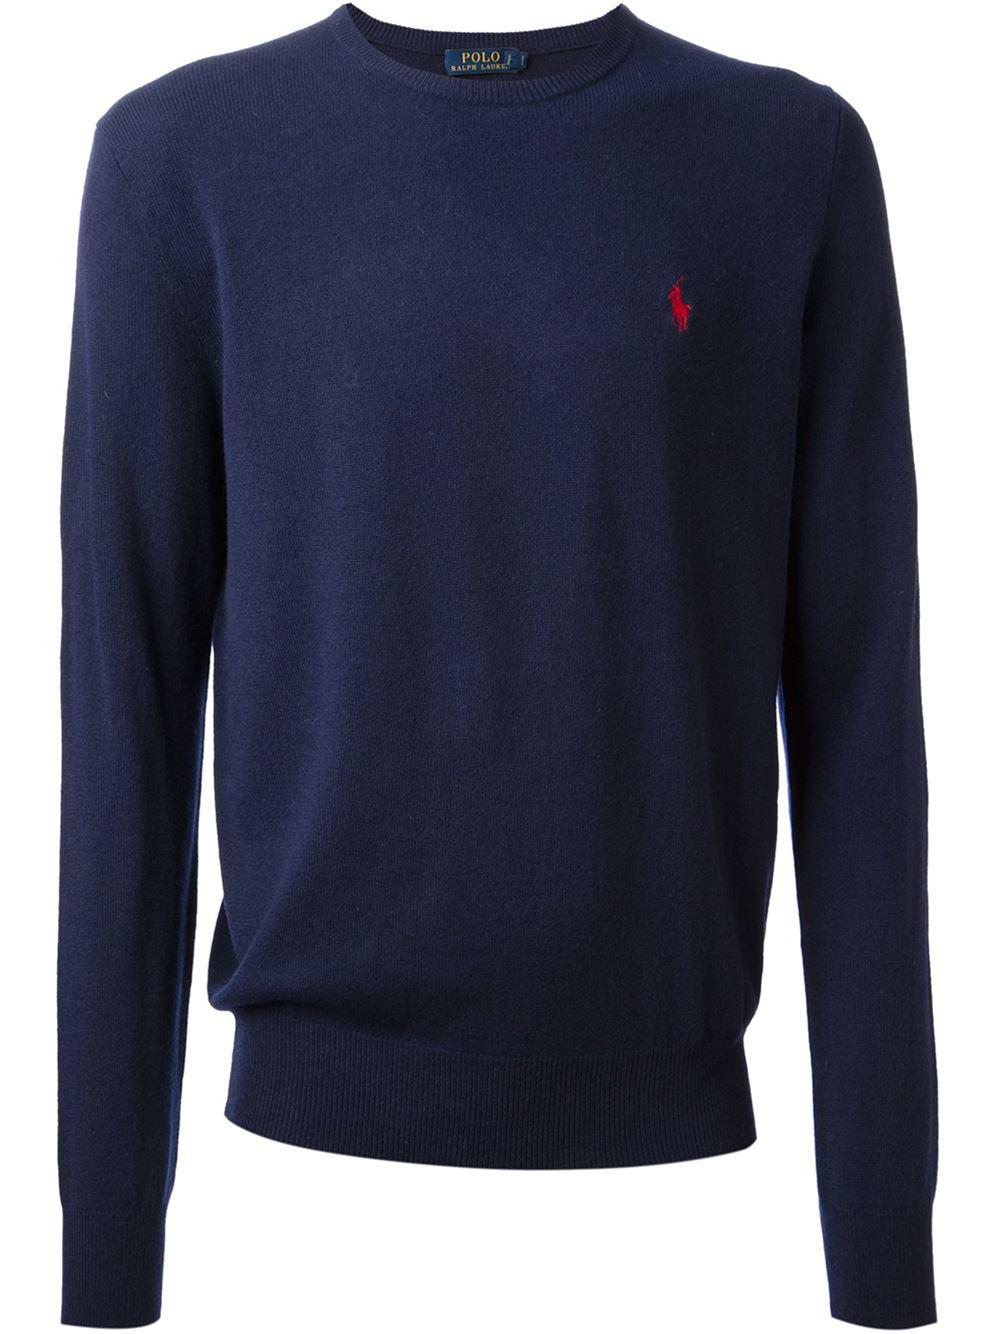 Polo Sweater Men